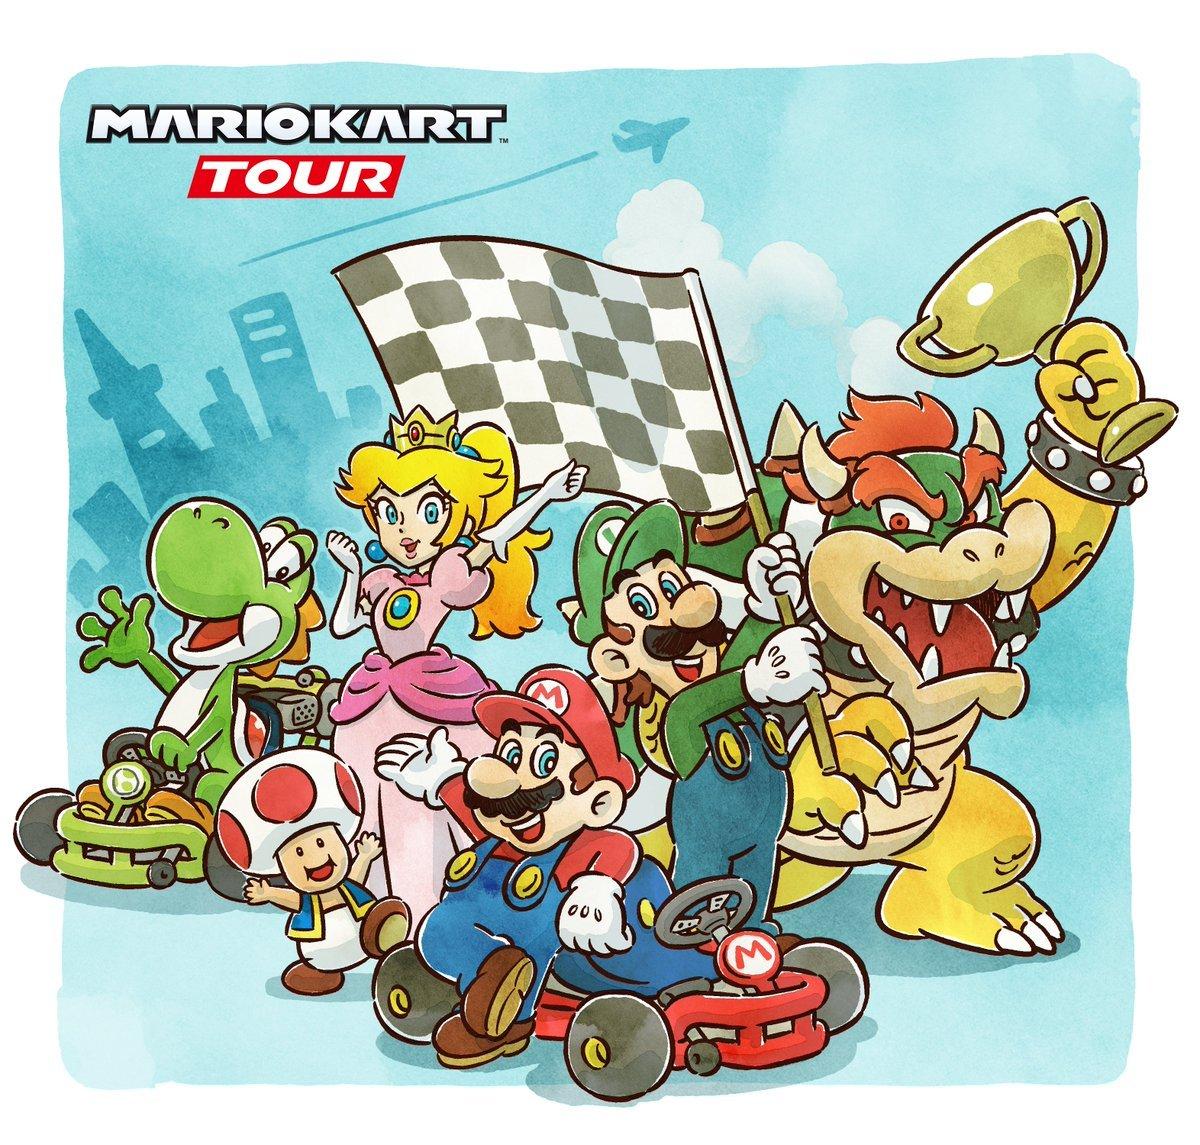 Mario Kart Tour Une Illustration Pour Celebrer Sa Sortie Mobile Nintendo Master